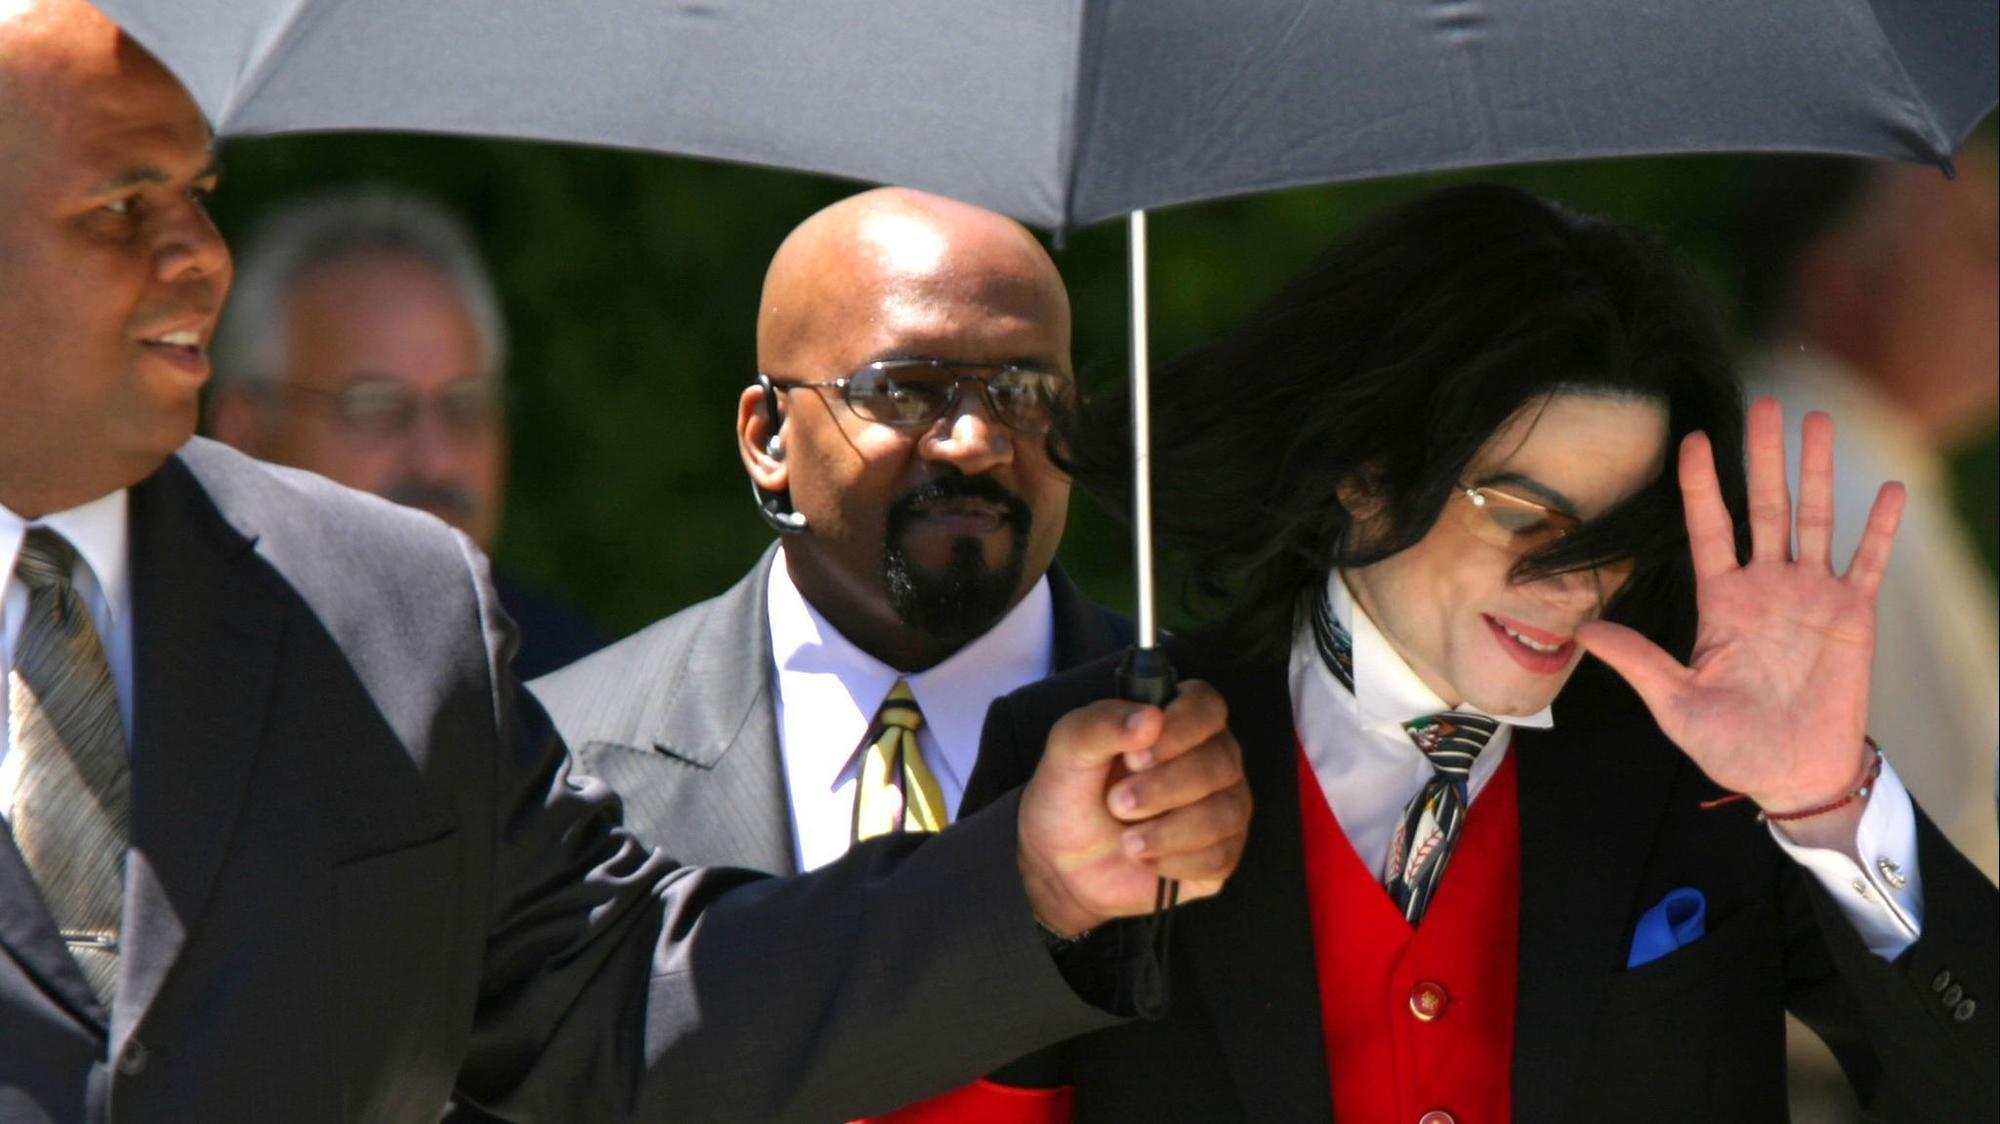 Michael Jackson's fans fight back against Sundance